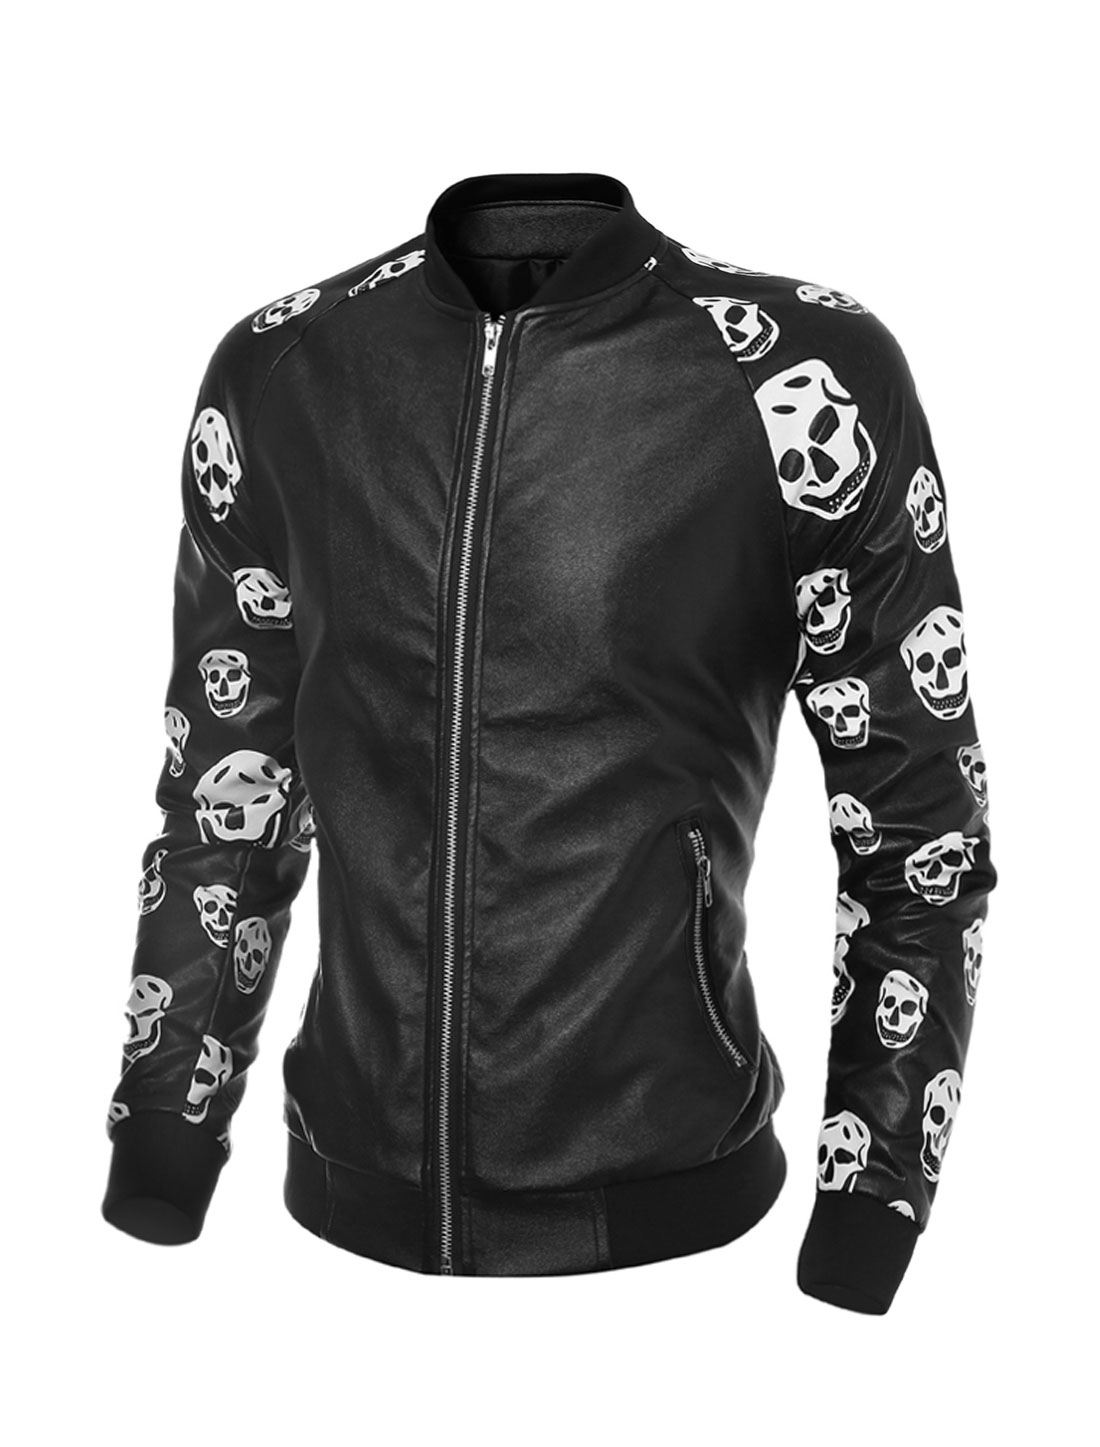 Man Collared Zippered Pockets Skulls PU Jacket Black M